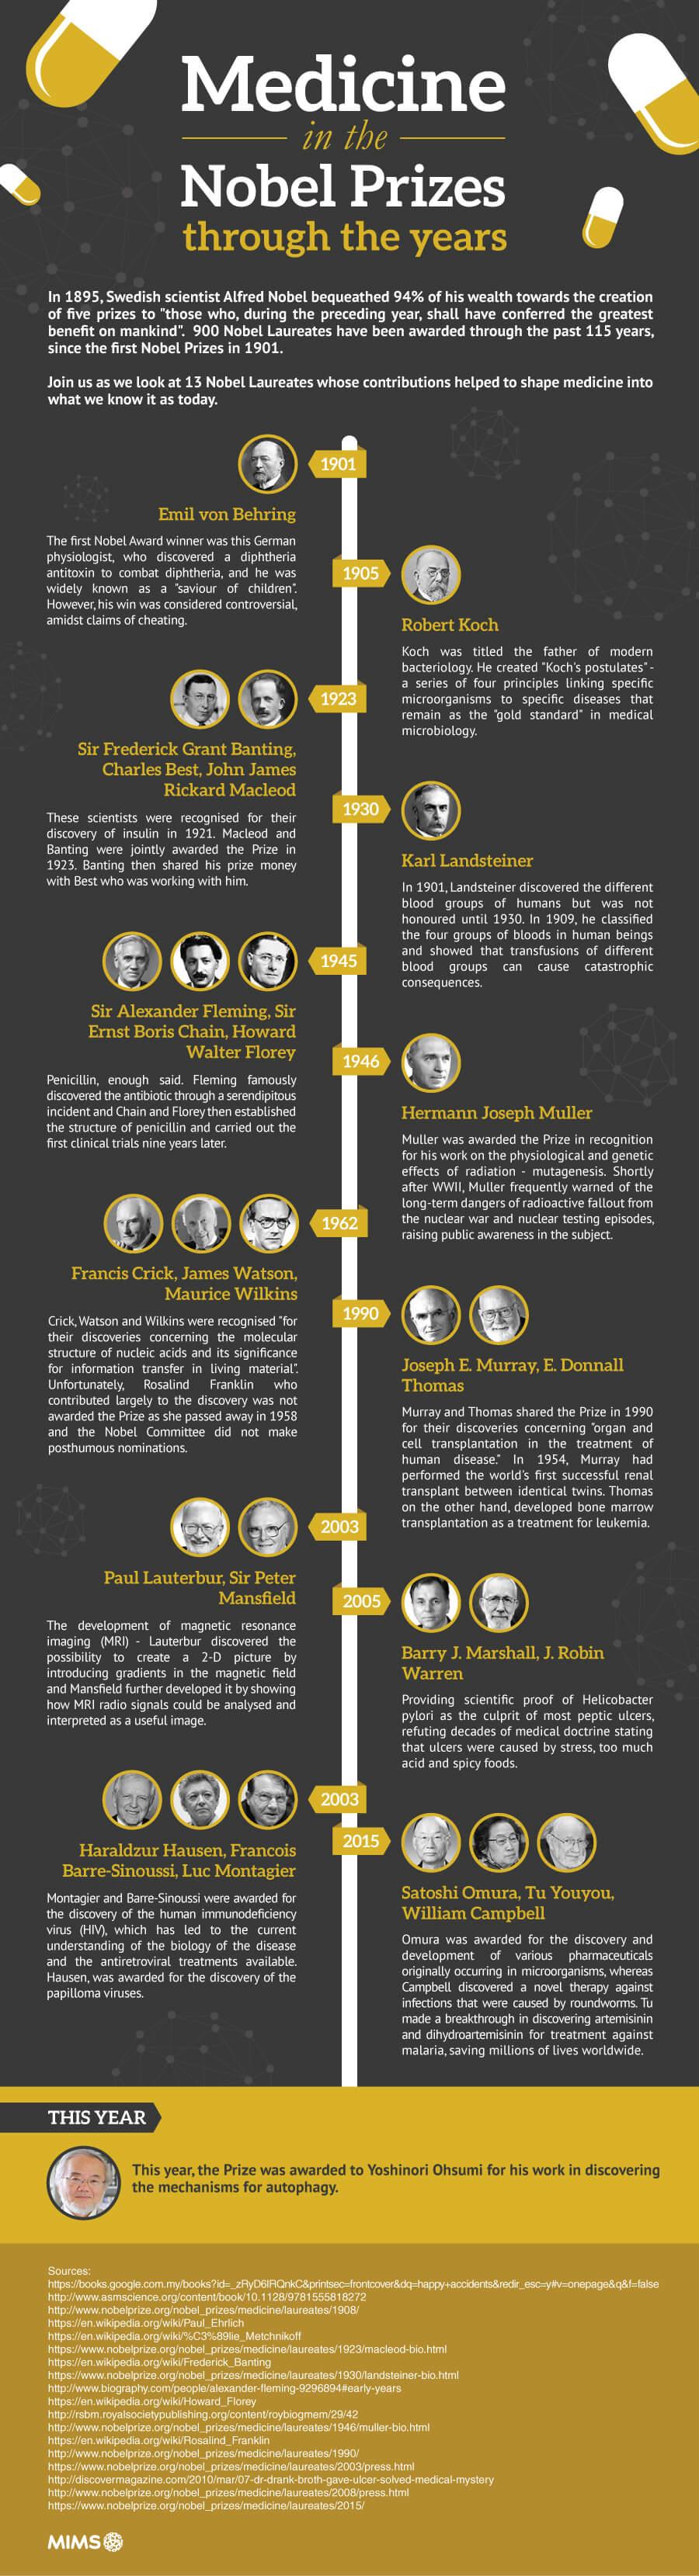 Nobel Prize winners for medicine across 115 years